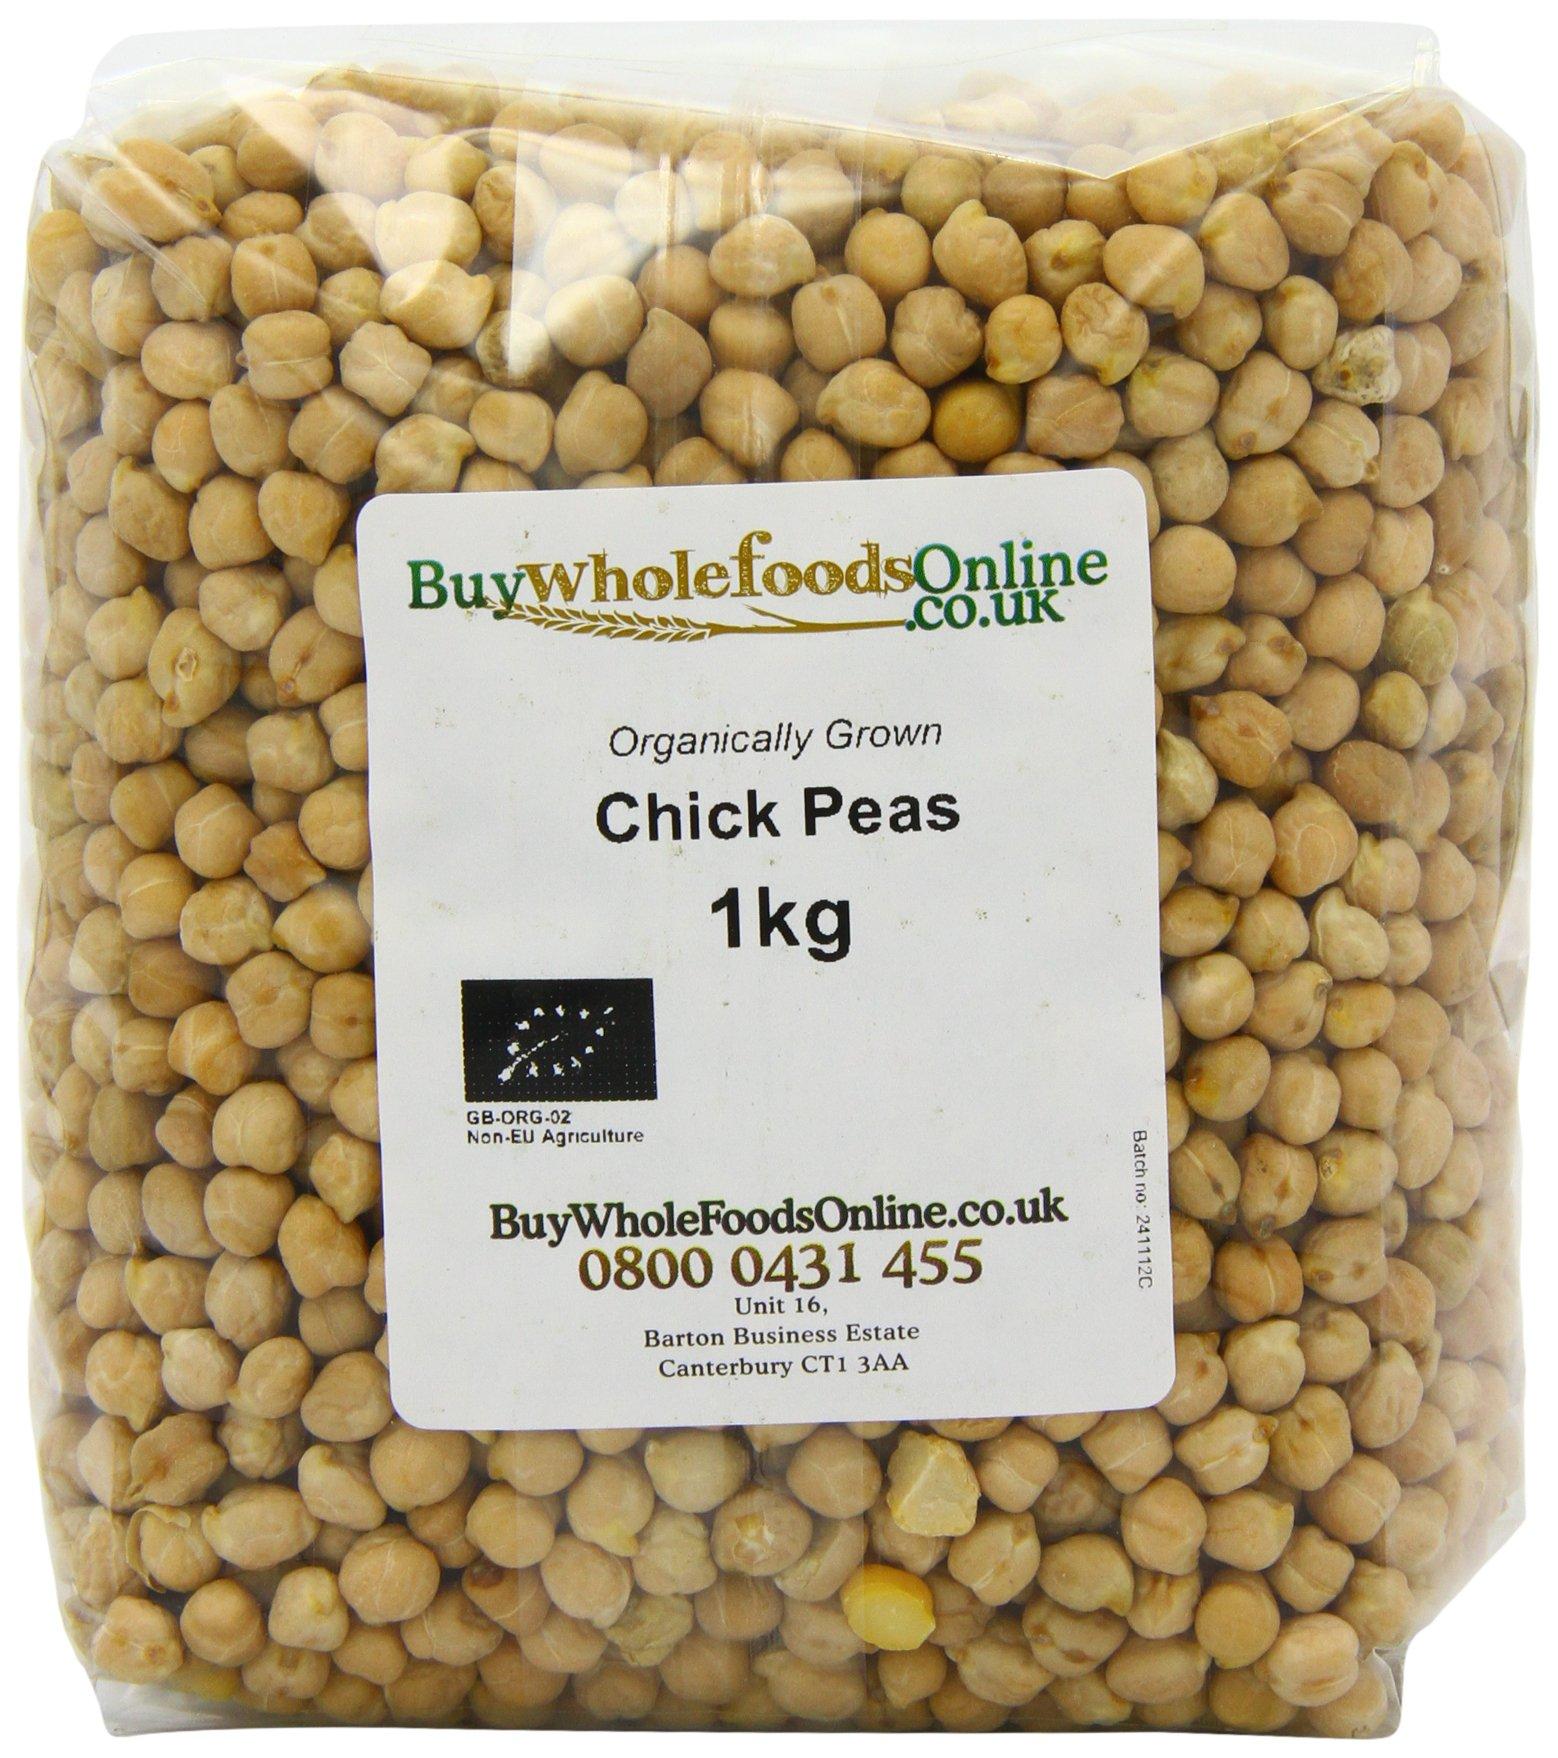 Buy Whole Foods Organic Chick Peas 1 Kg